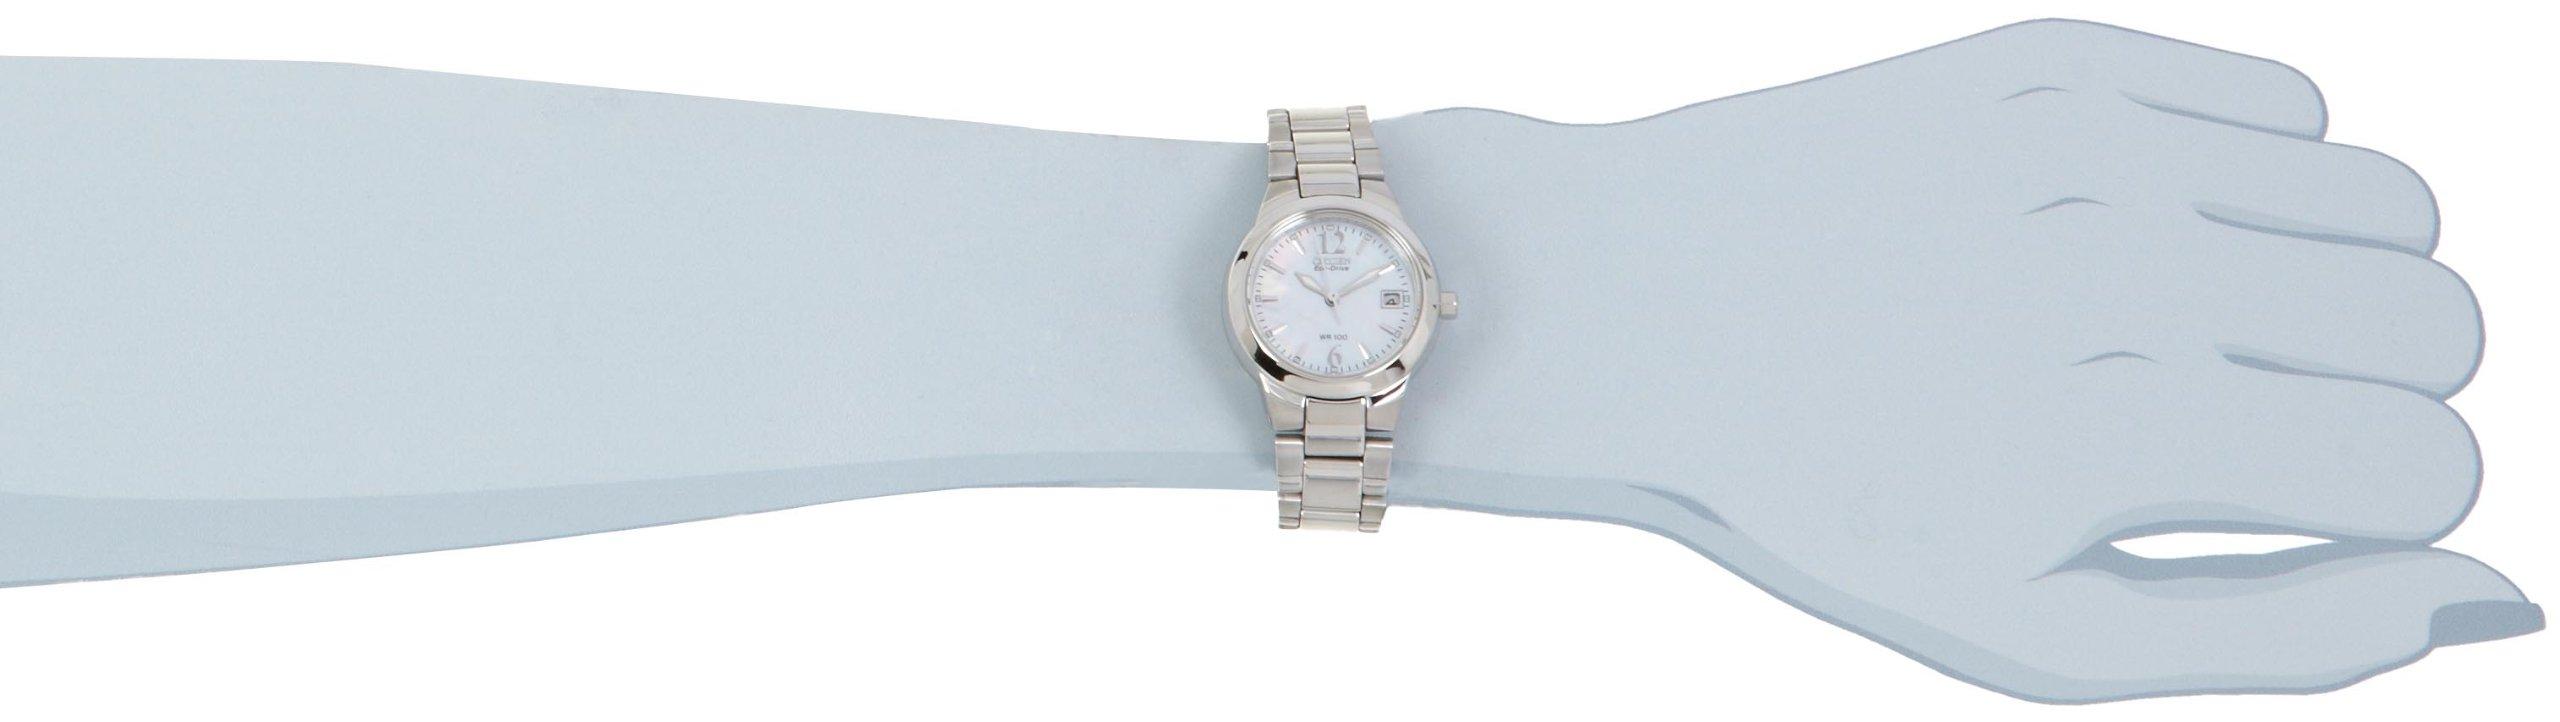 Citizen Women's EW1670-59D ''Silhouette'' Stainless Steel Eco-Drive Watch